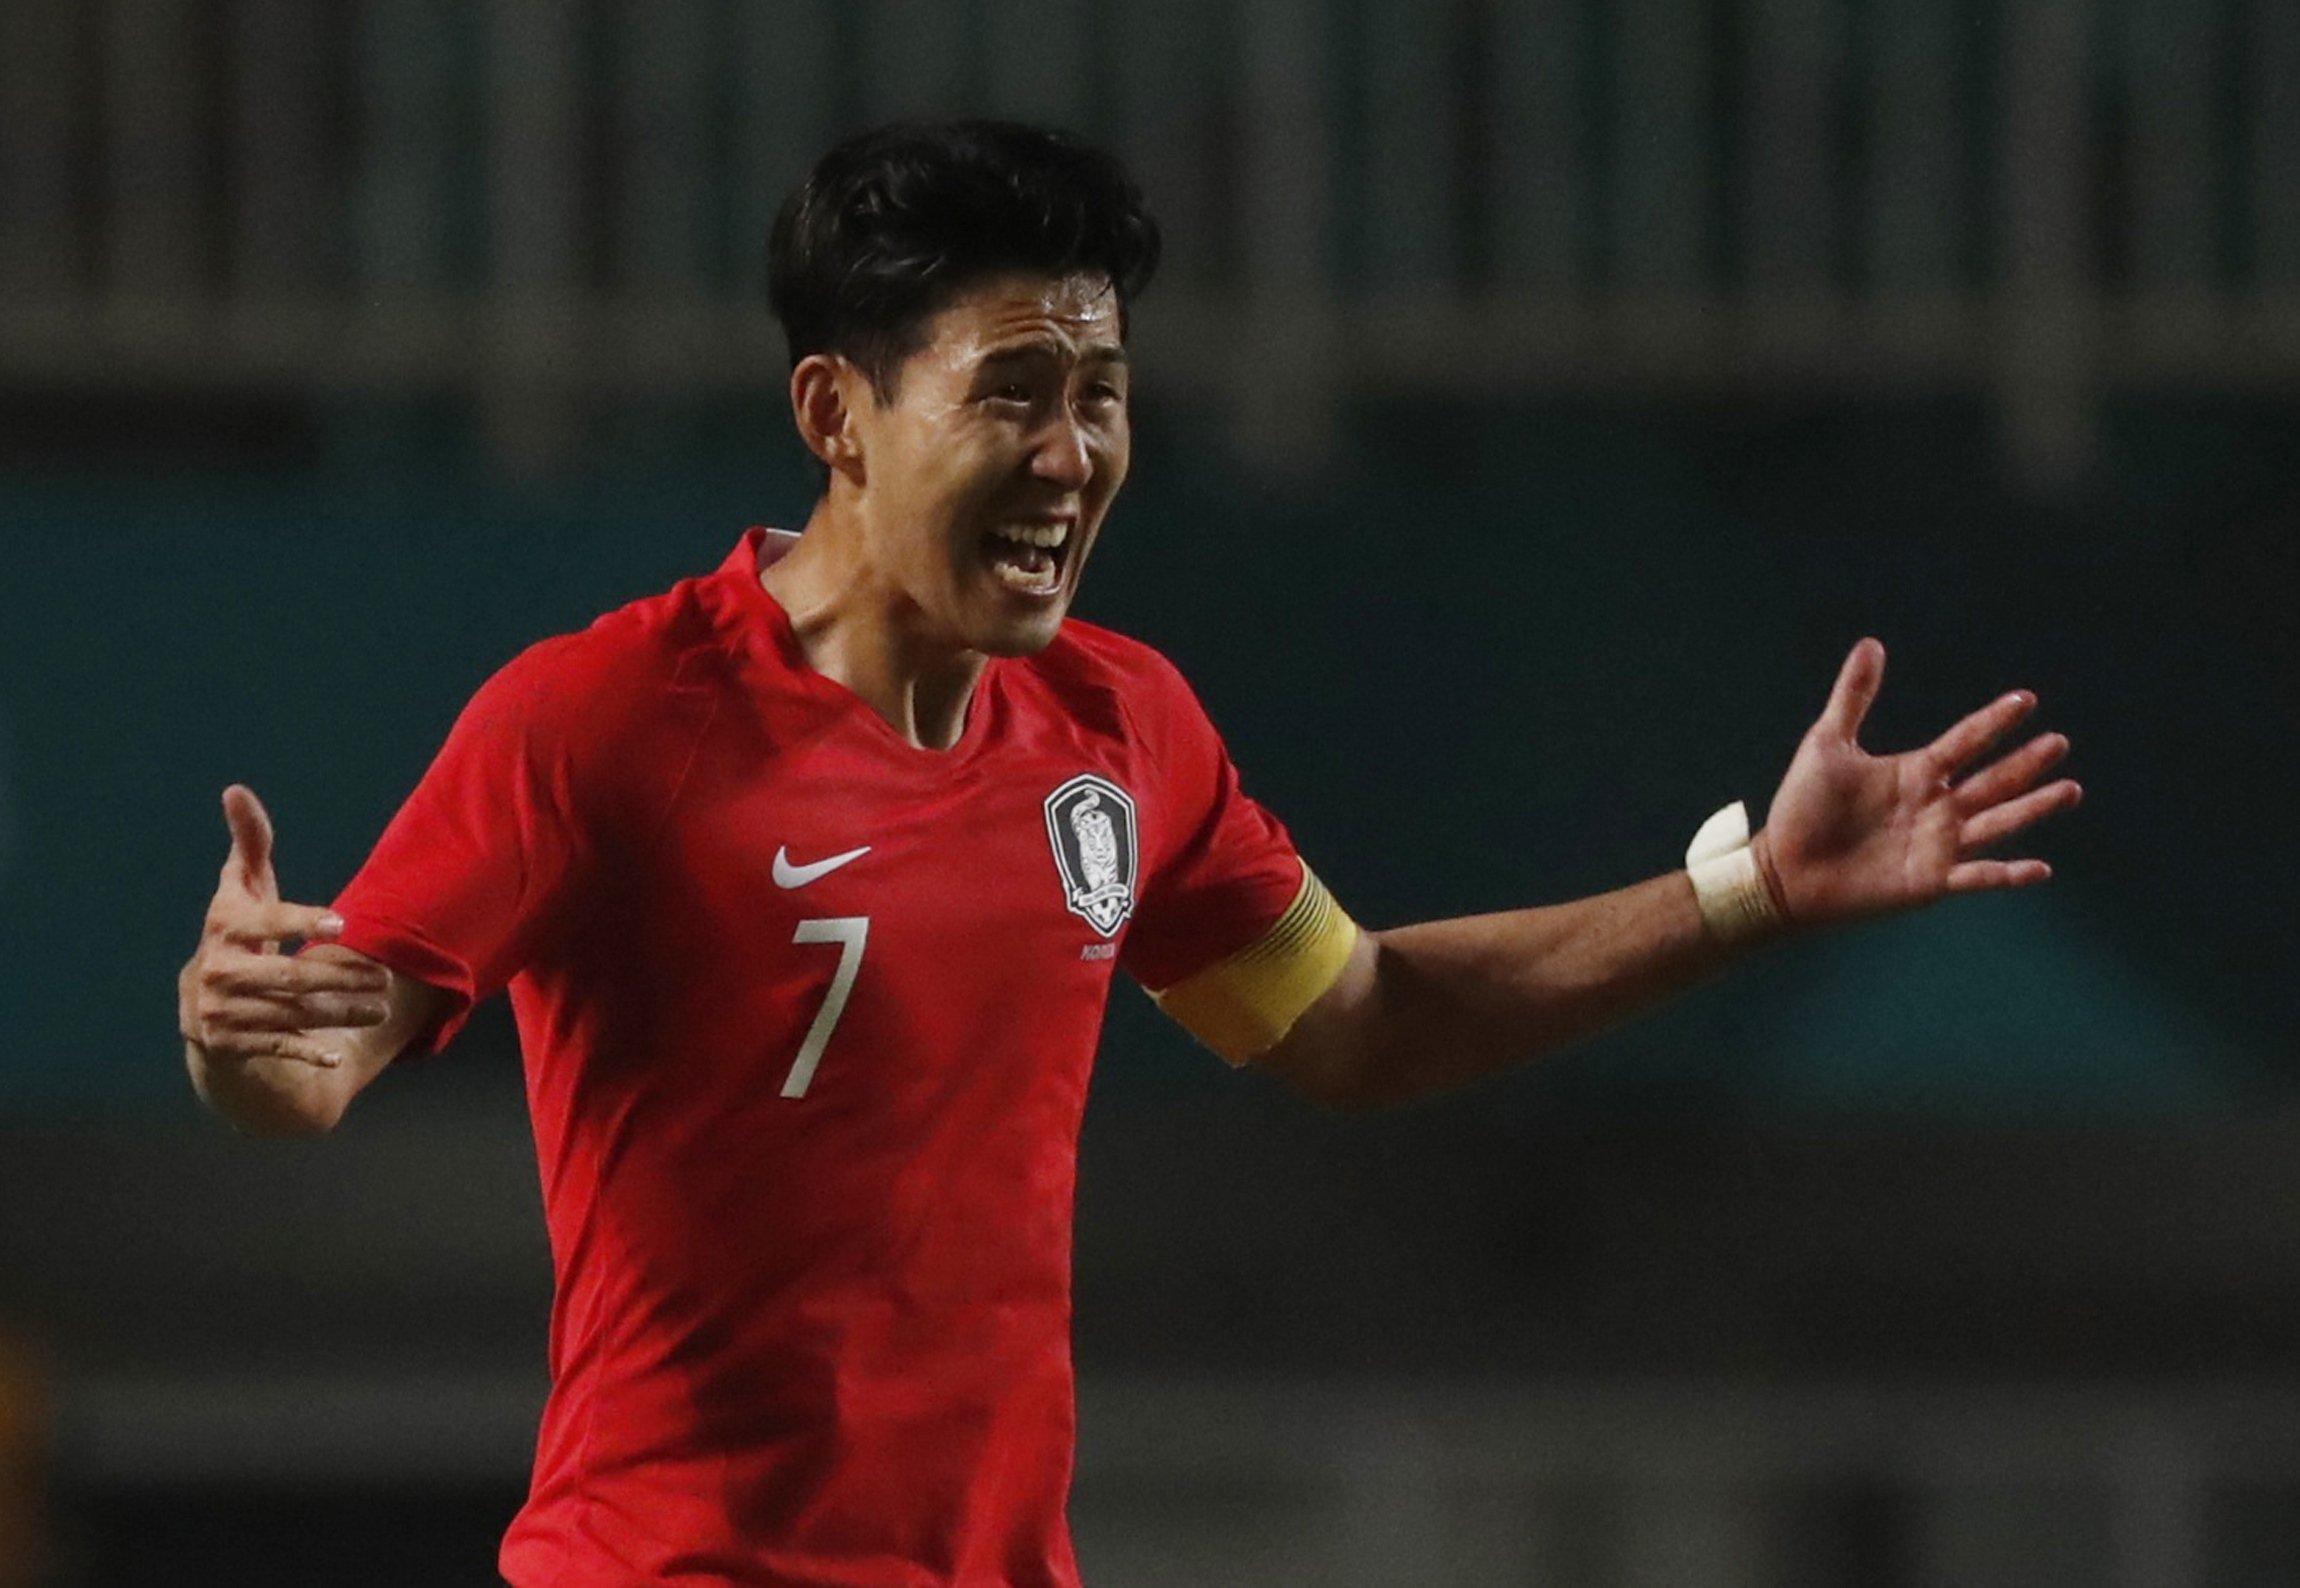 Soccer Football - 2018 Asian Games - Men's Gold Medal Match - South Korea v Japan - Stadion Pakansari - Bogor, Indonesia - September 1, 2018 - Son Heung Min of South Korea reacts. REUTERS/Darren Whiteside